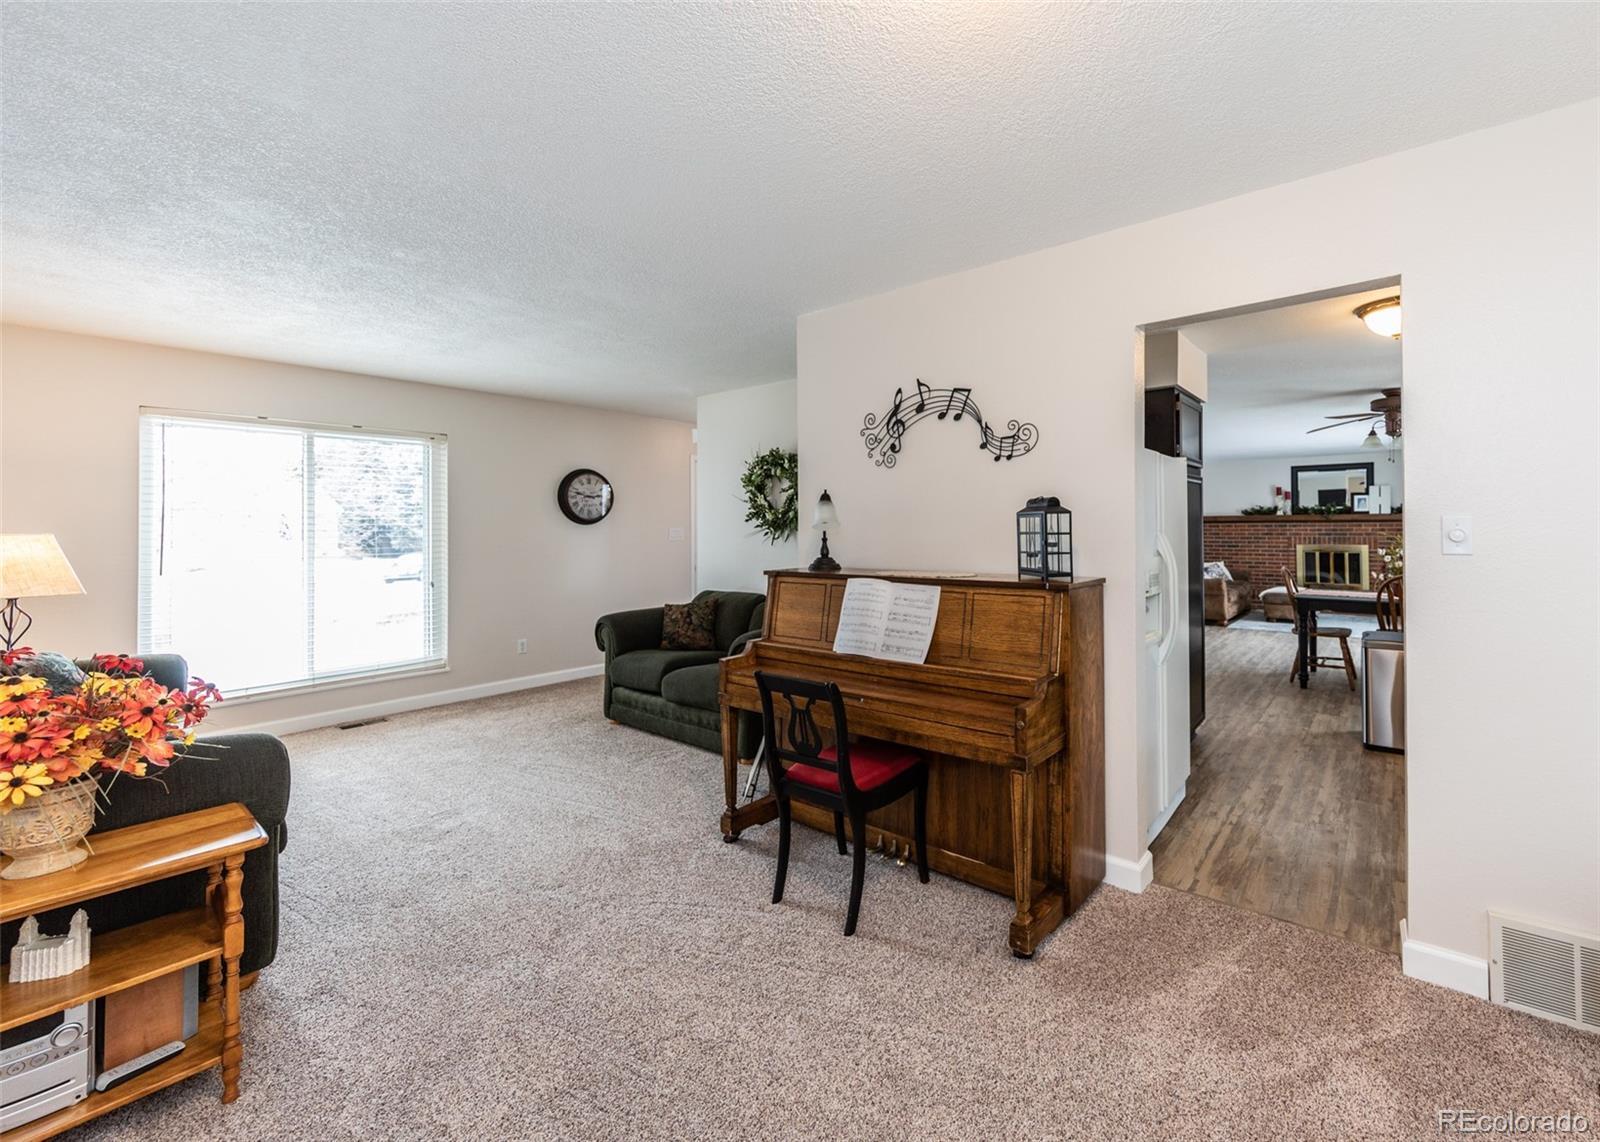 MLS# 6603774 - 12 - 4947 Harvest Road, Colorado Springs, CO 80917